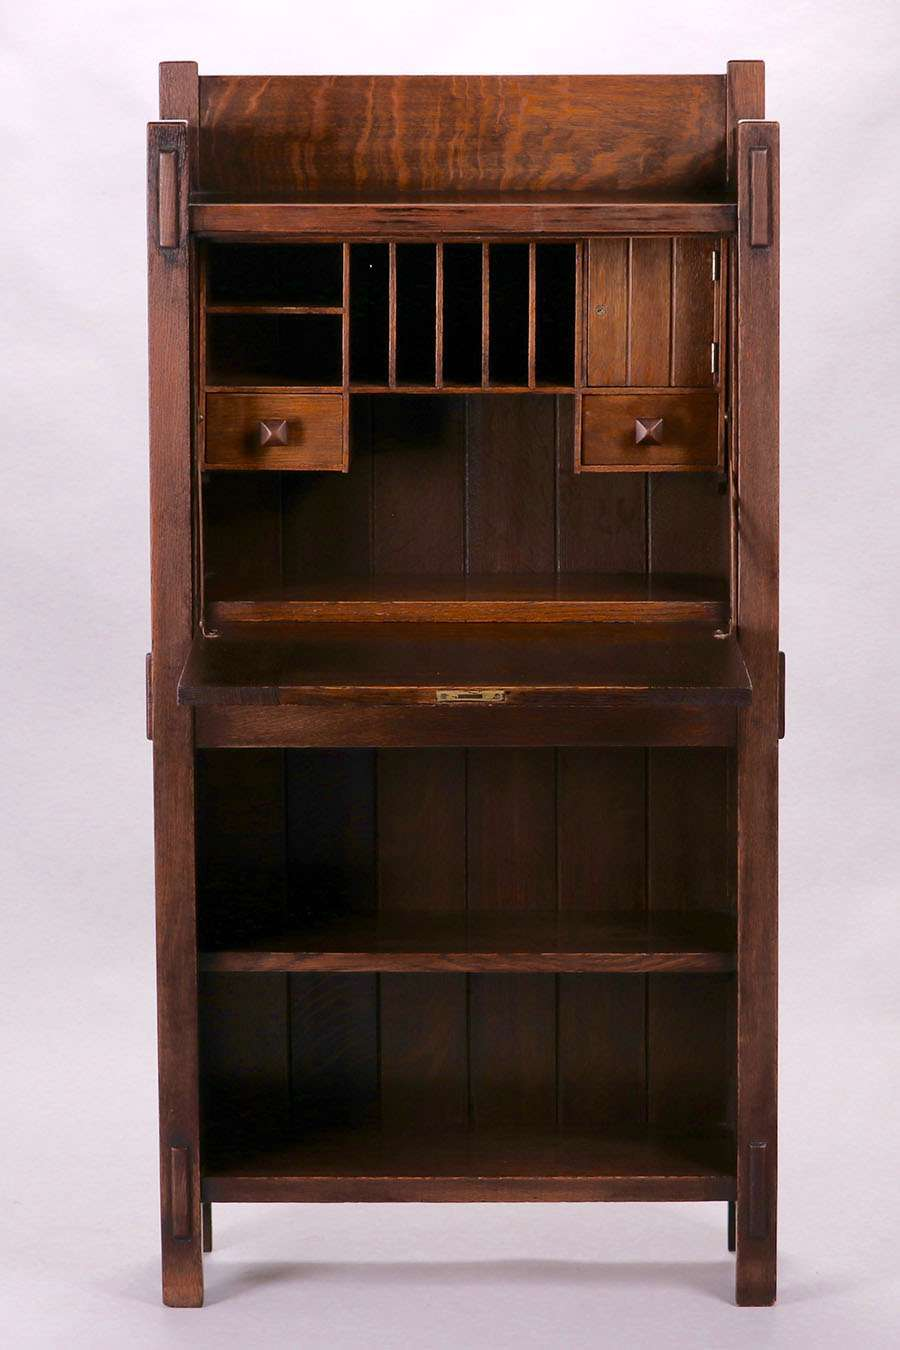 Early Gustav Stickley Strap Hinge Dropfront Desk C1901